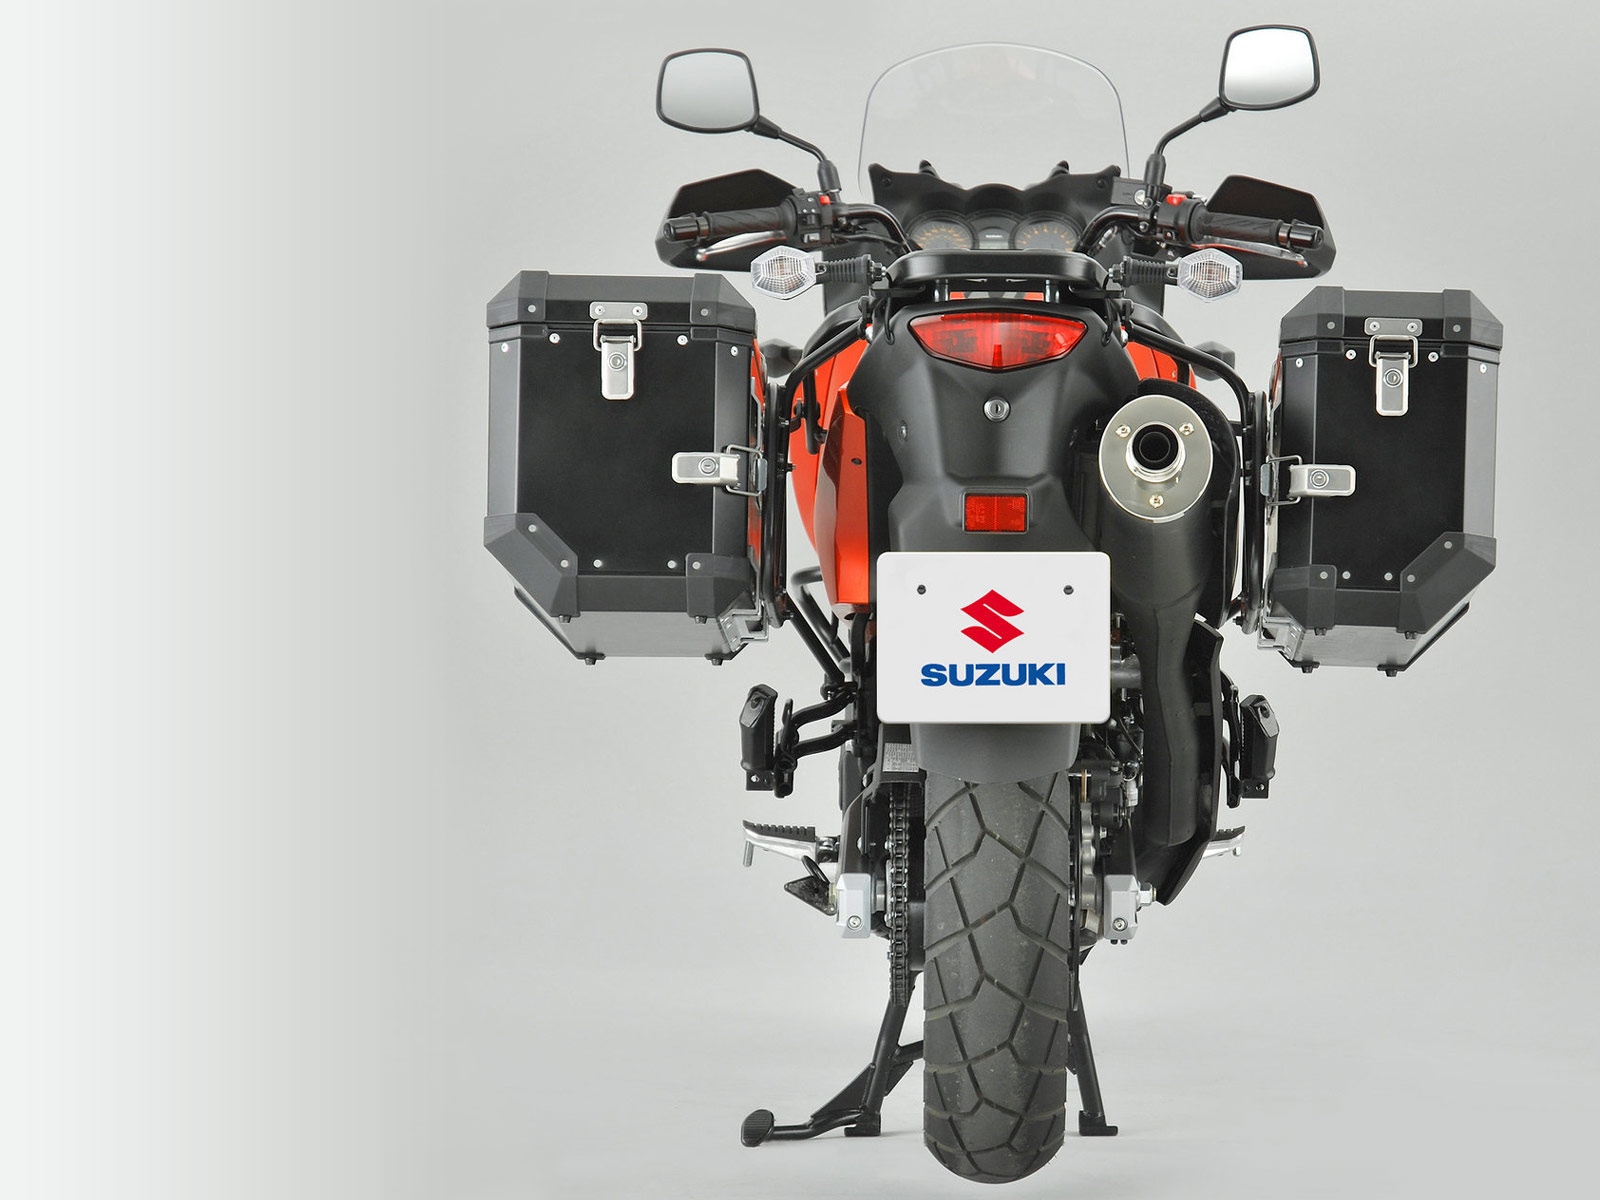 suzuki v strom 650 abs 2012 best fuel injection motorboxer. Black Bedroom Furniture Sets. Home Design Ideas